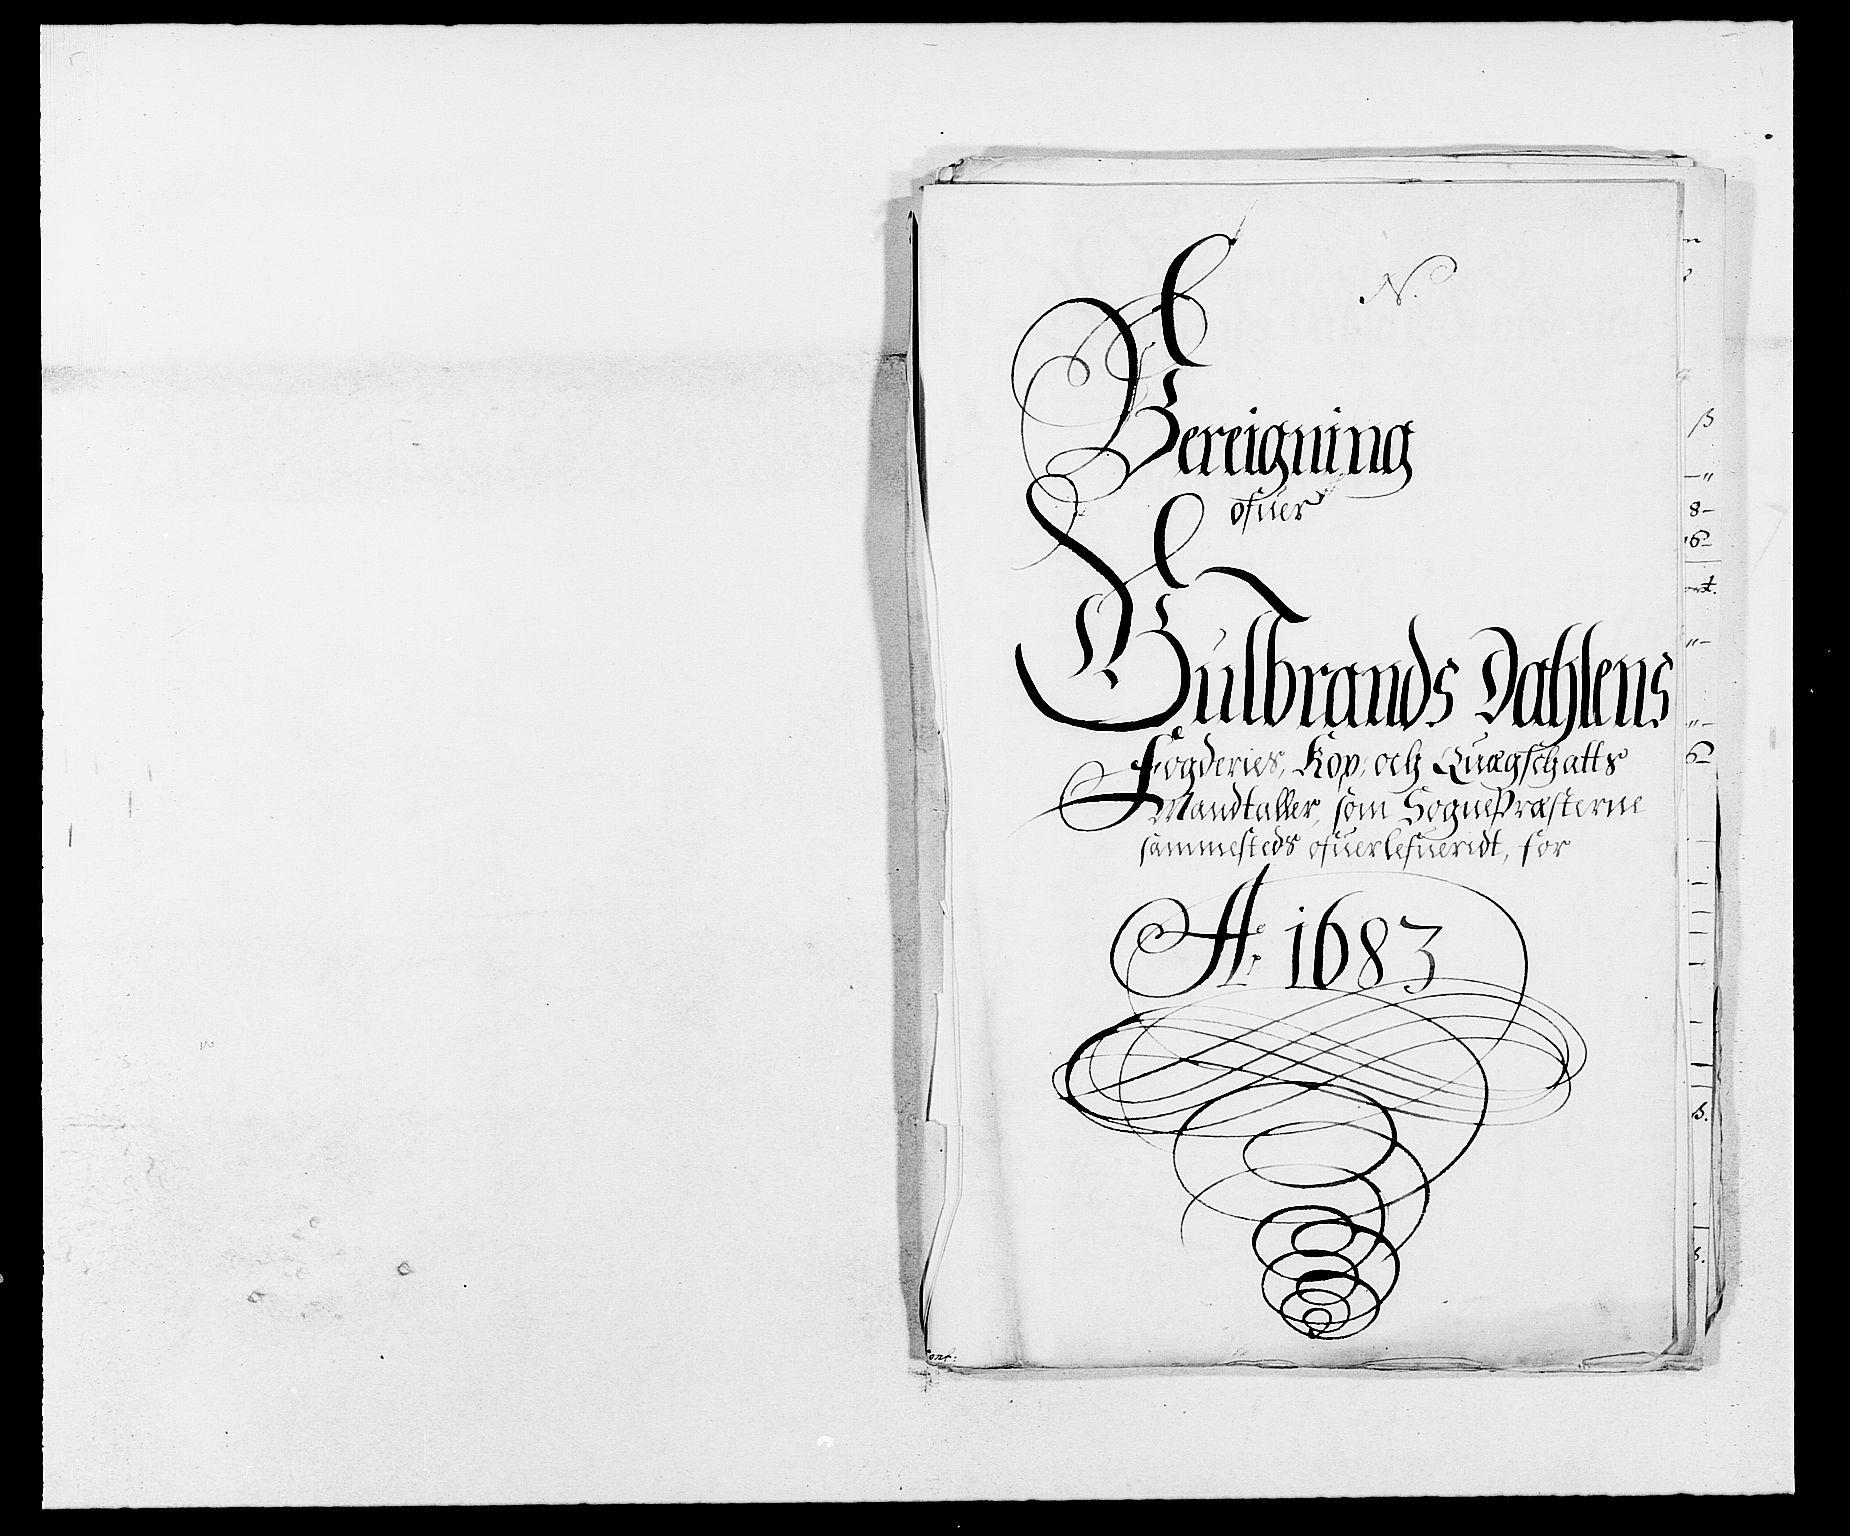 RA, Rentekammeret inntil 1814, Reviderte regnskaper, Fogderegnskap, R17/L1158: Fogderegnskap Gudbrandsdal, 1682-1689, s. 273